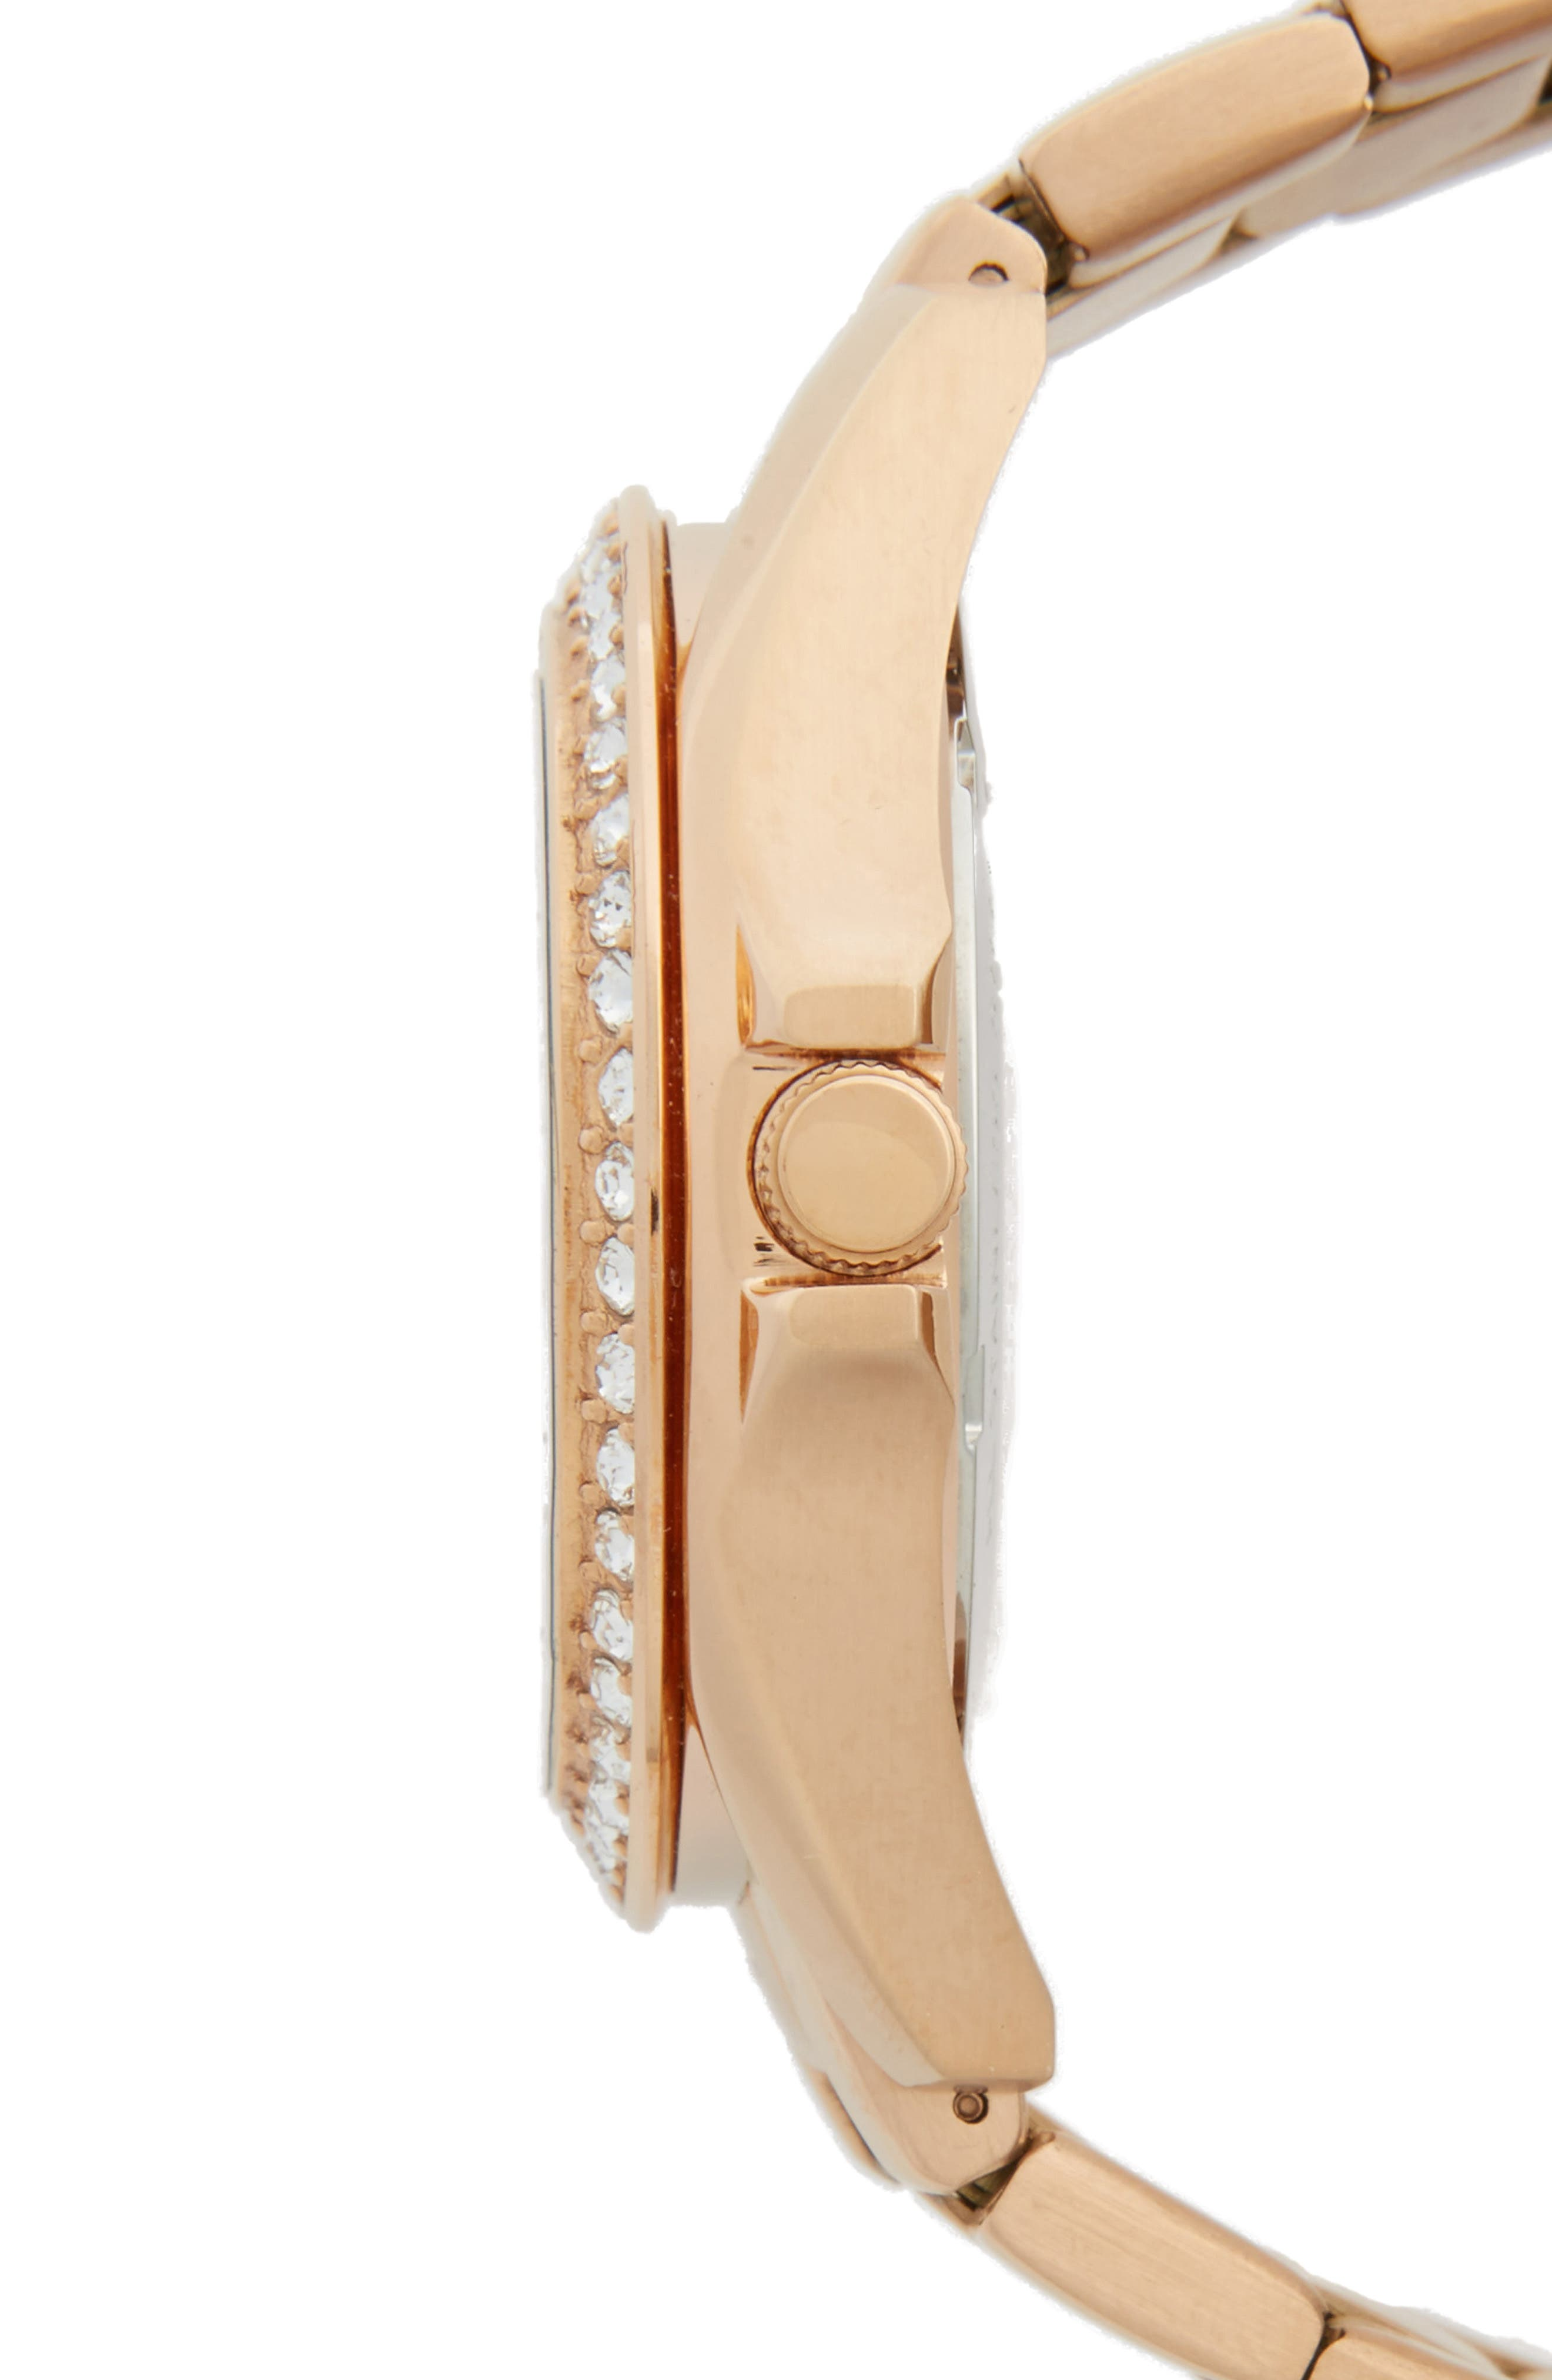 FOSSIL, 'Riley' Round Crystal Bezel Bracelet Watch, 38mm, Alternate thumbnail 3, color, ROSE GOLD